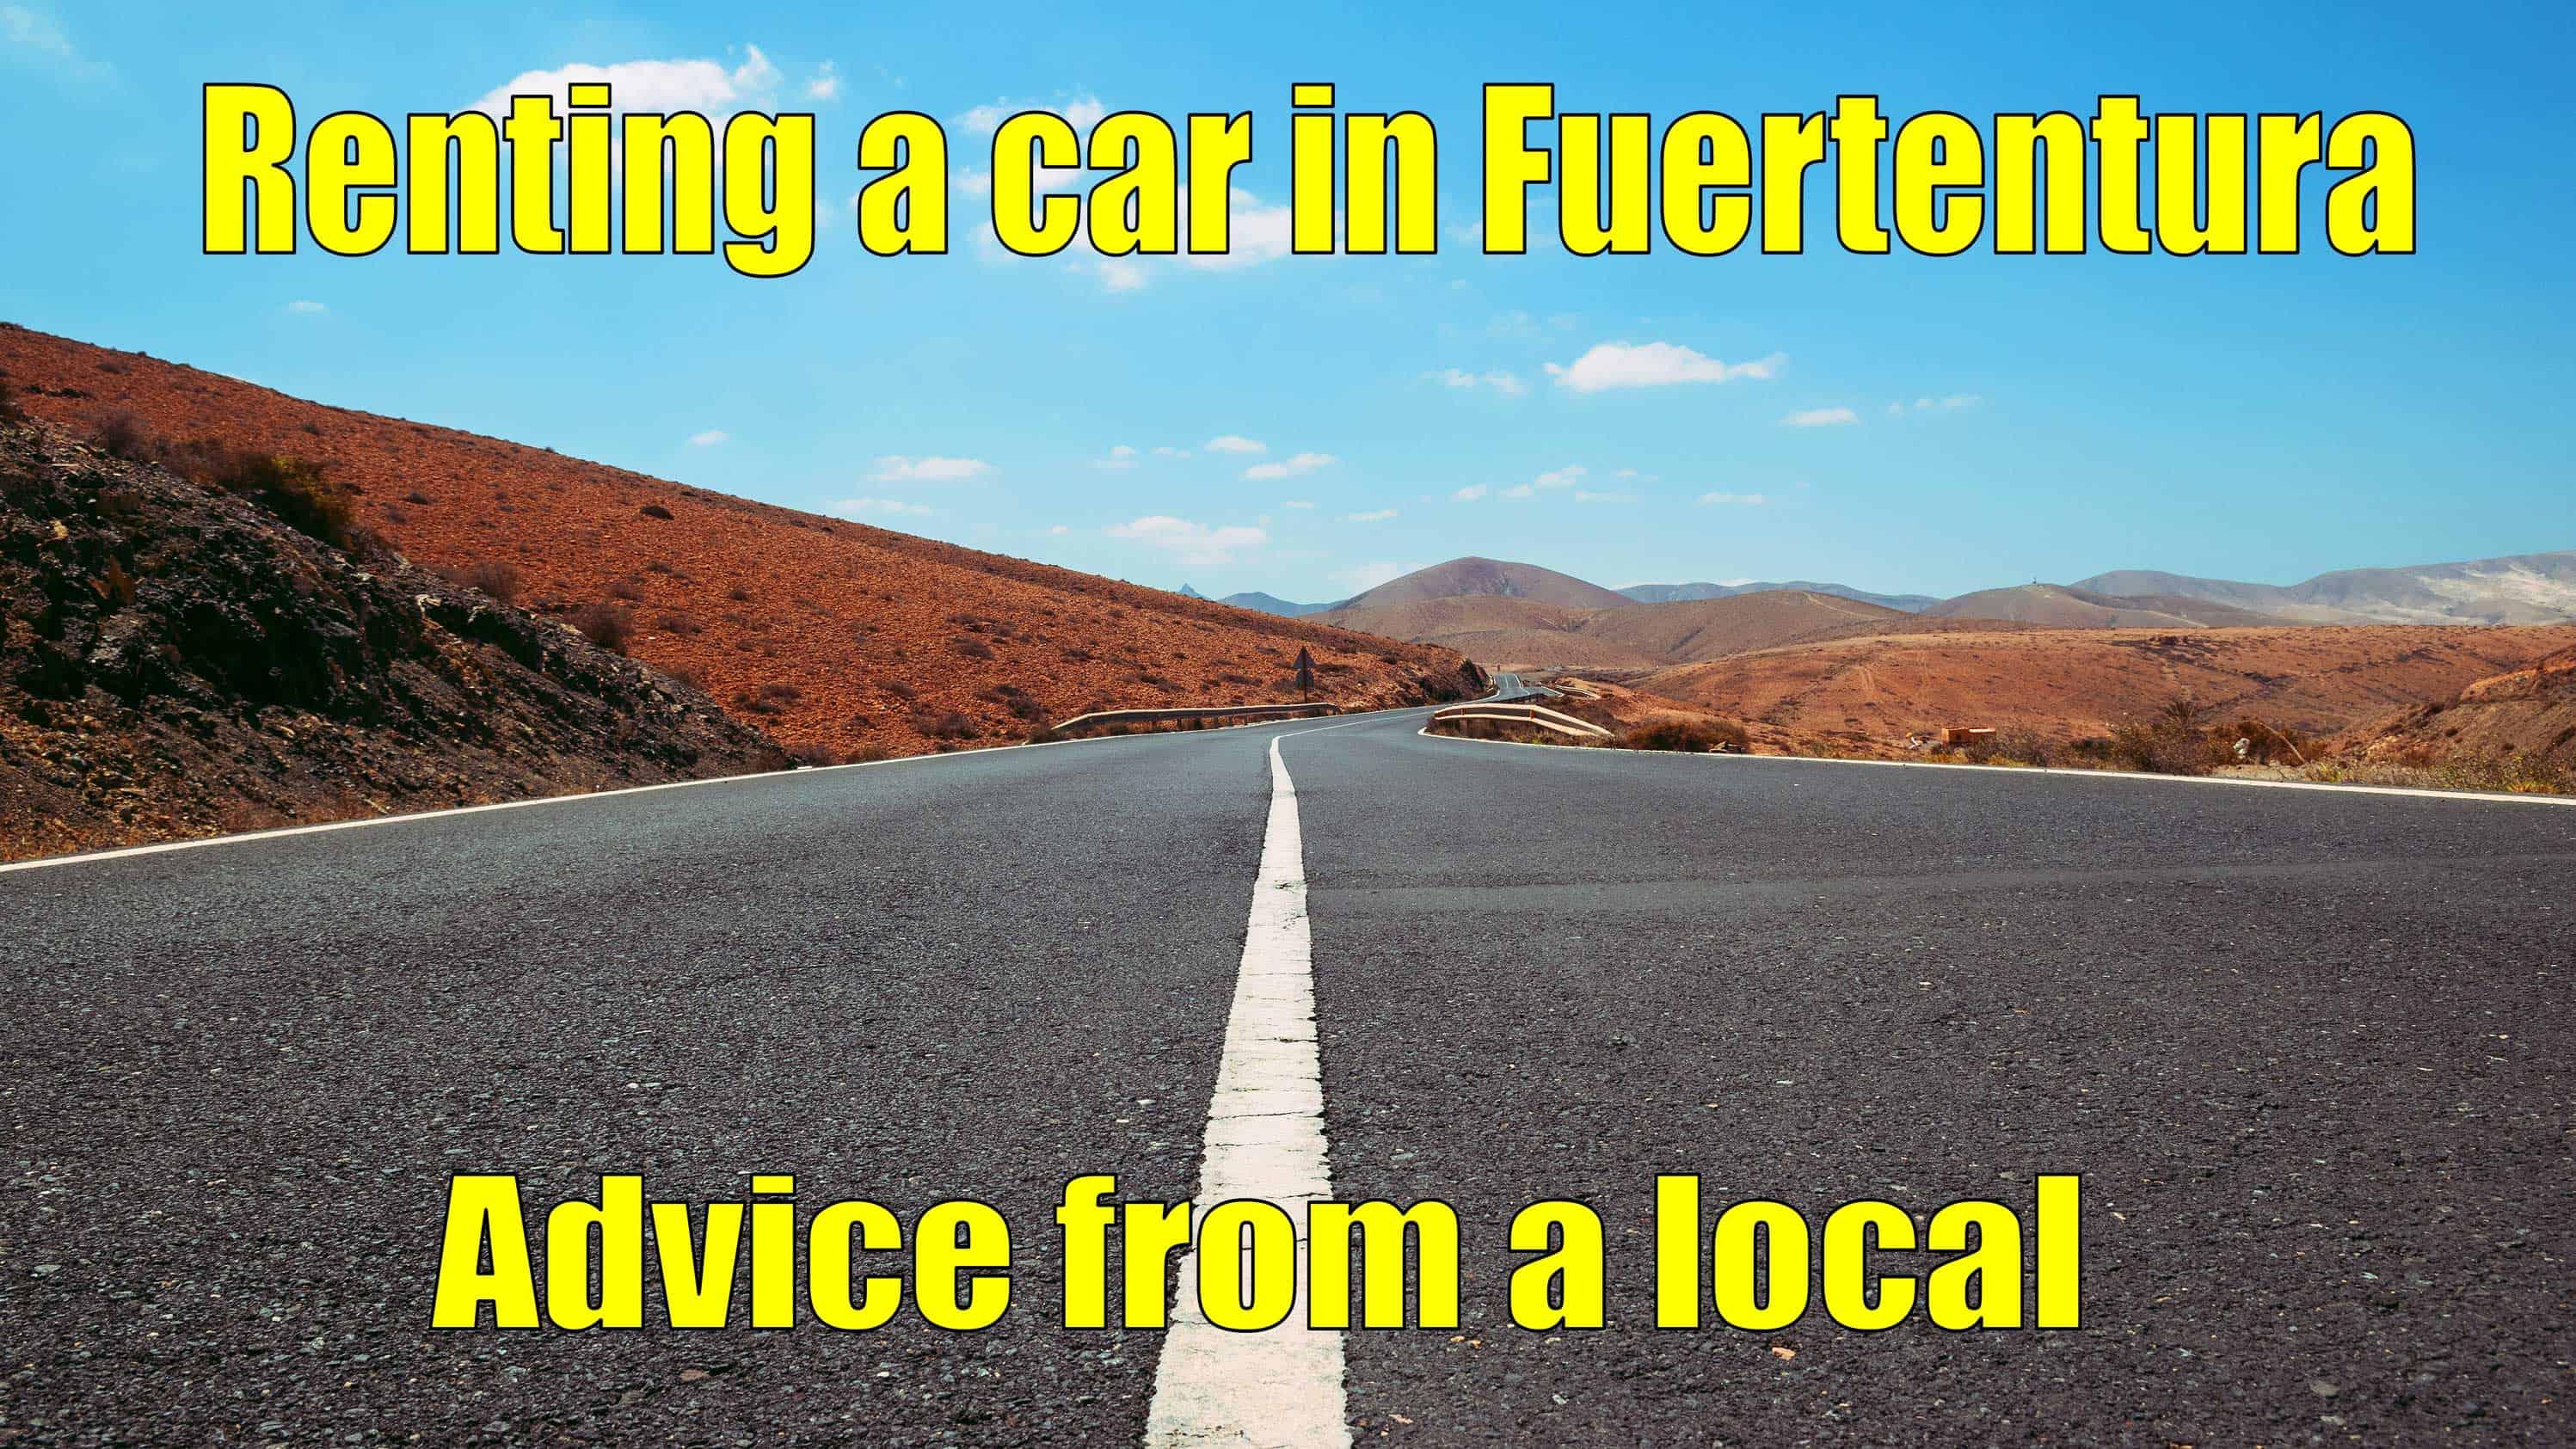 Renting a car in Fuerteventura